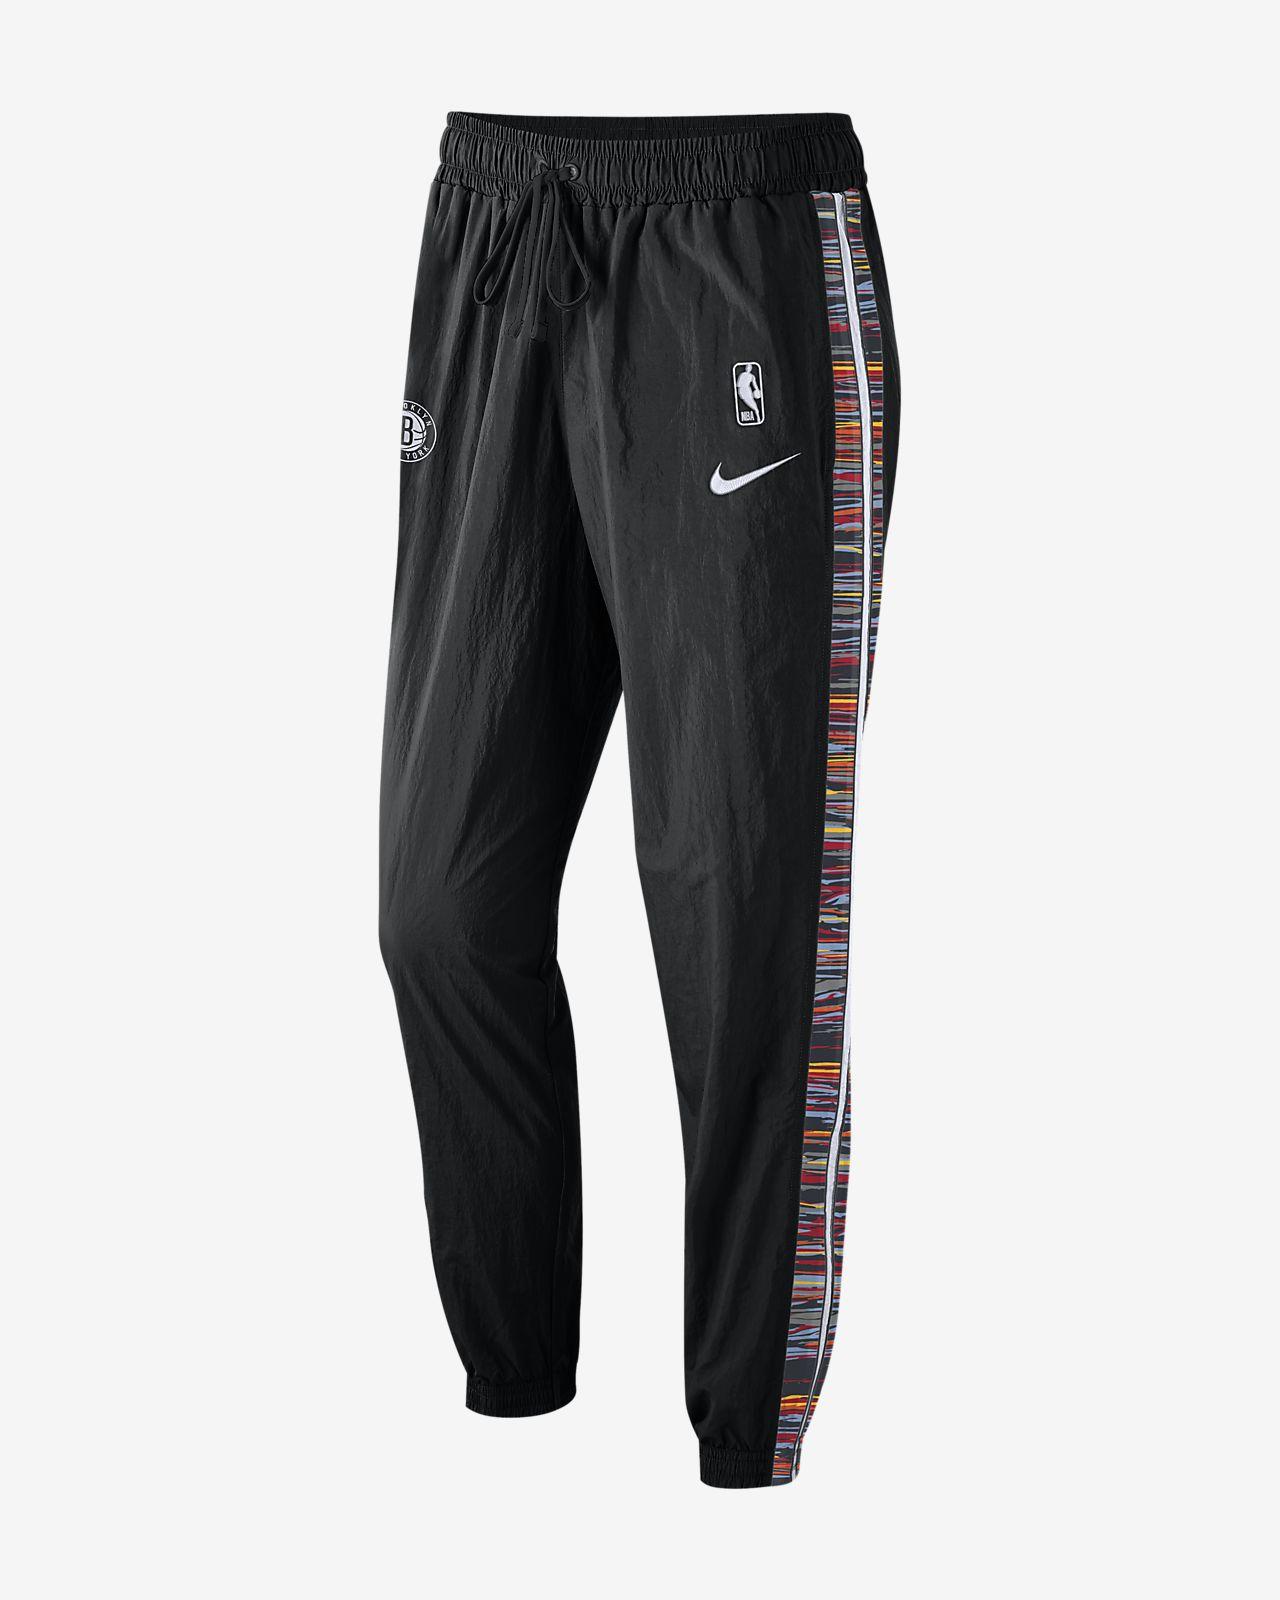 布鲁克林篮网队 Courtside City Edition Nike NBA 男子运动长裤